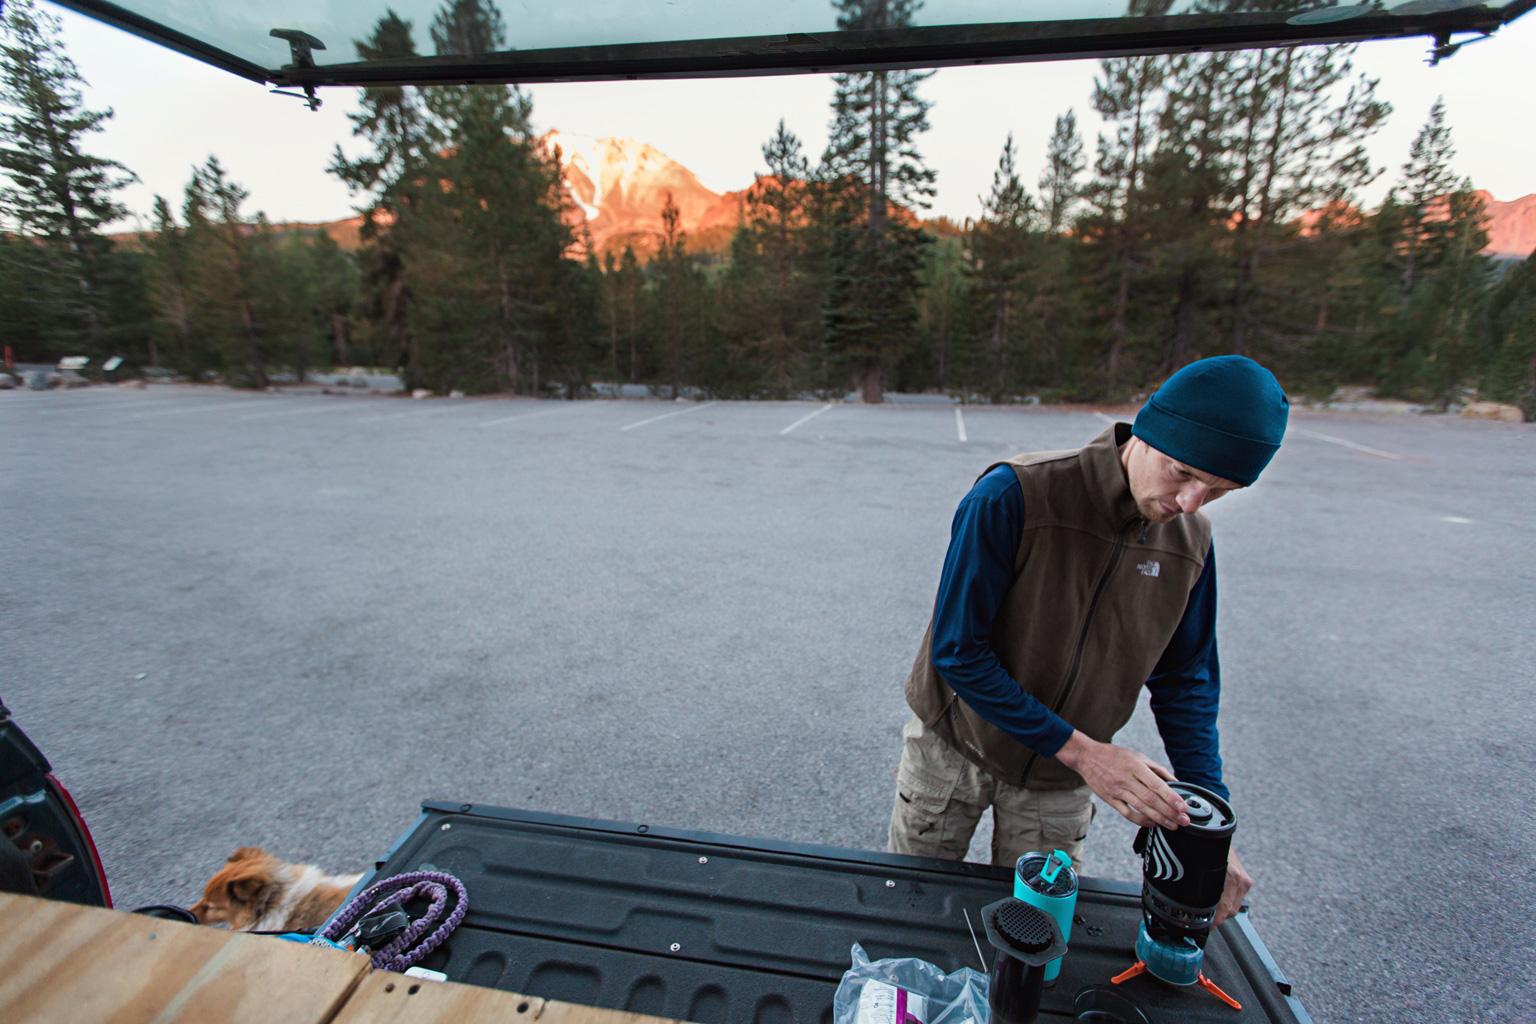 CindyGiovagnoli_Lassen_Volcanic_National_Park_California_camp_road_trip-029.jpg